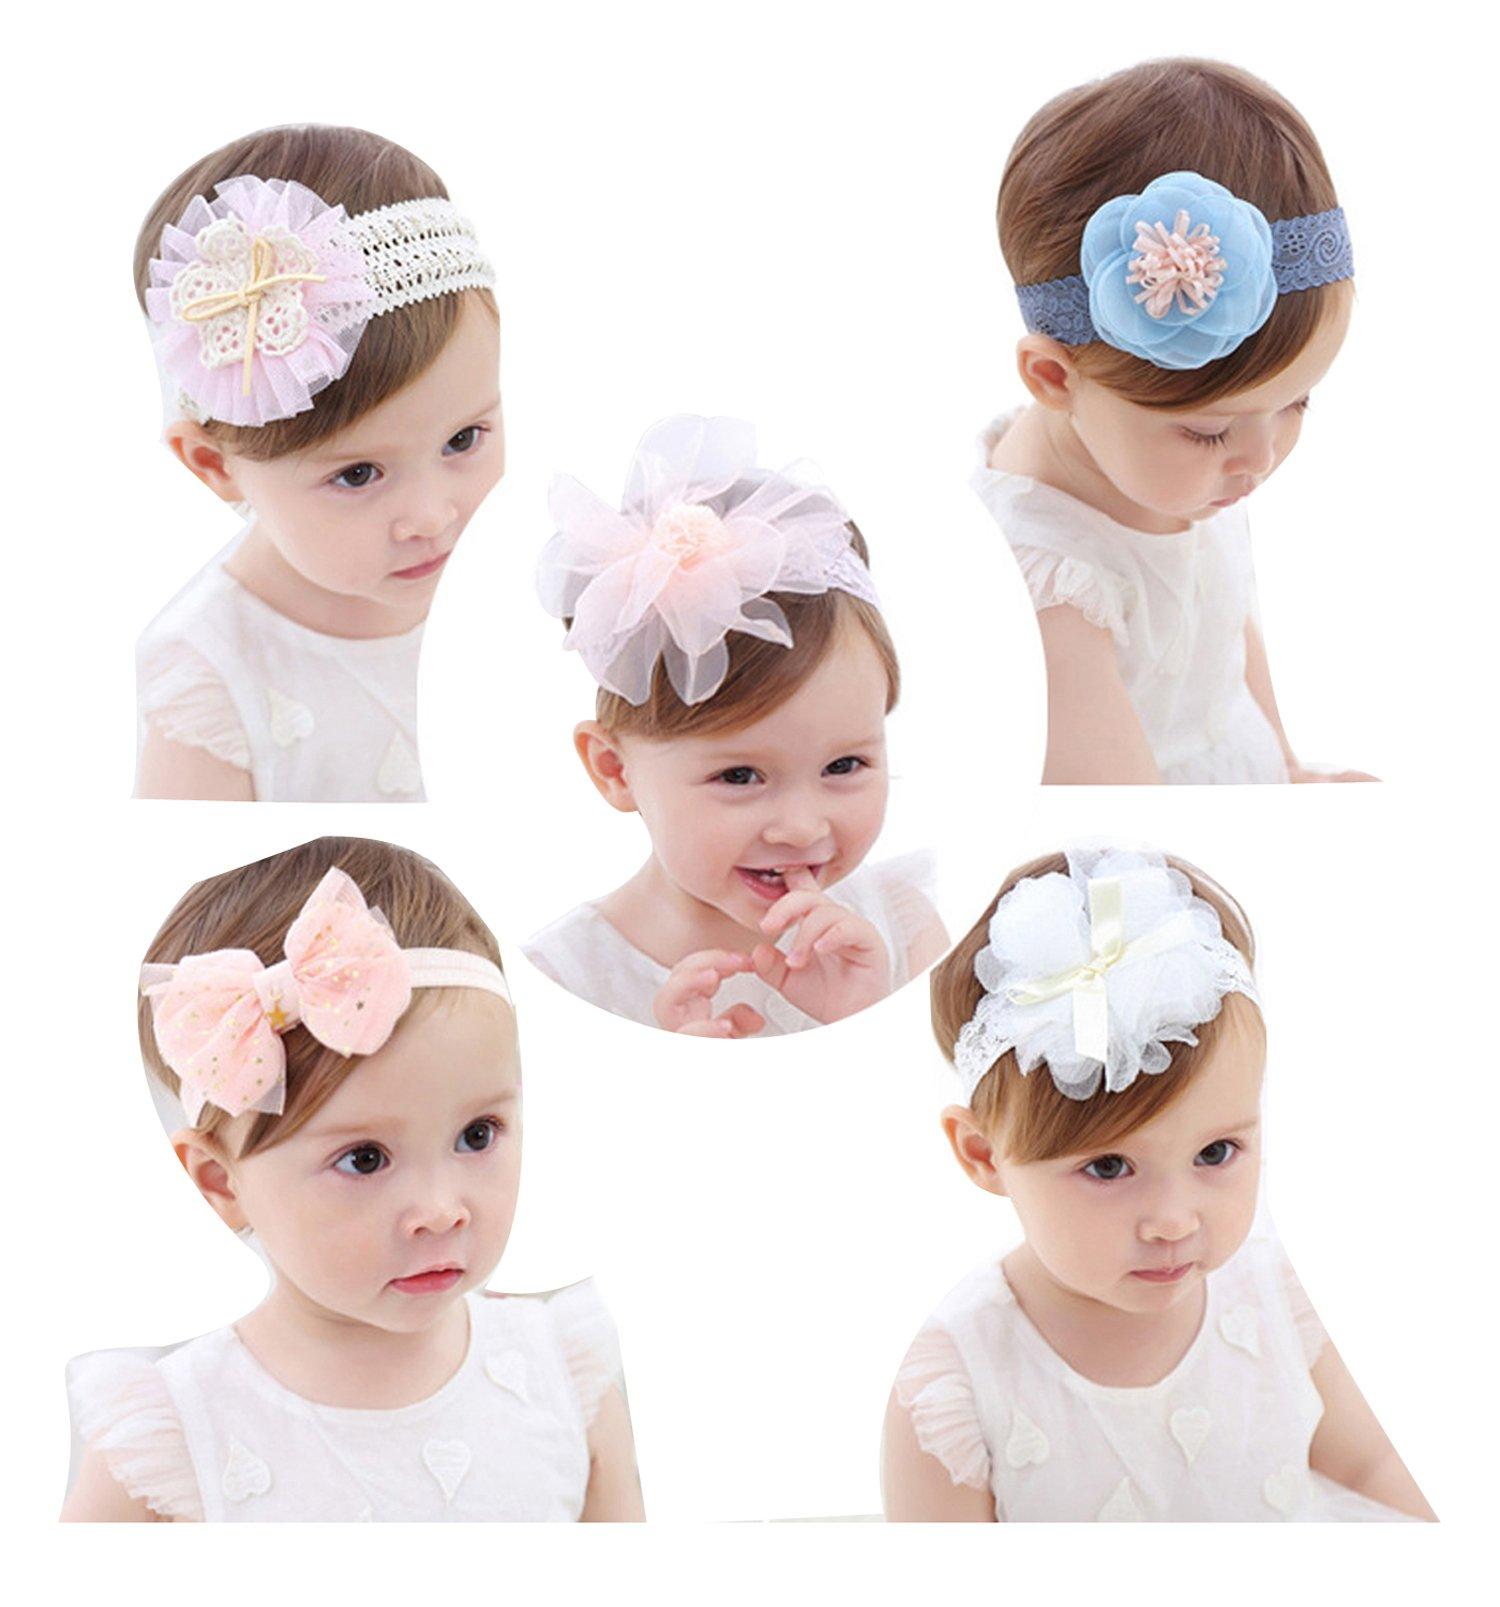 Cute Headband Accessories, 5Pcs Lovely Baby Girls Flower Headbands Photography Props